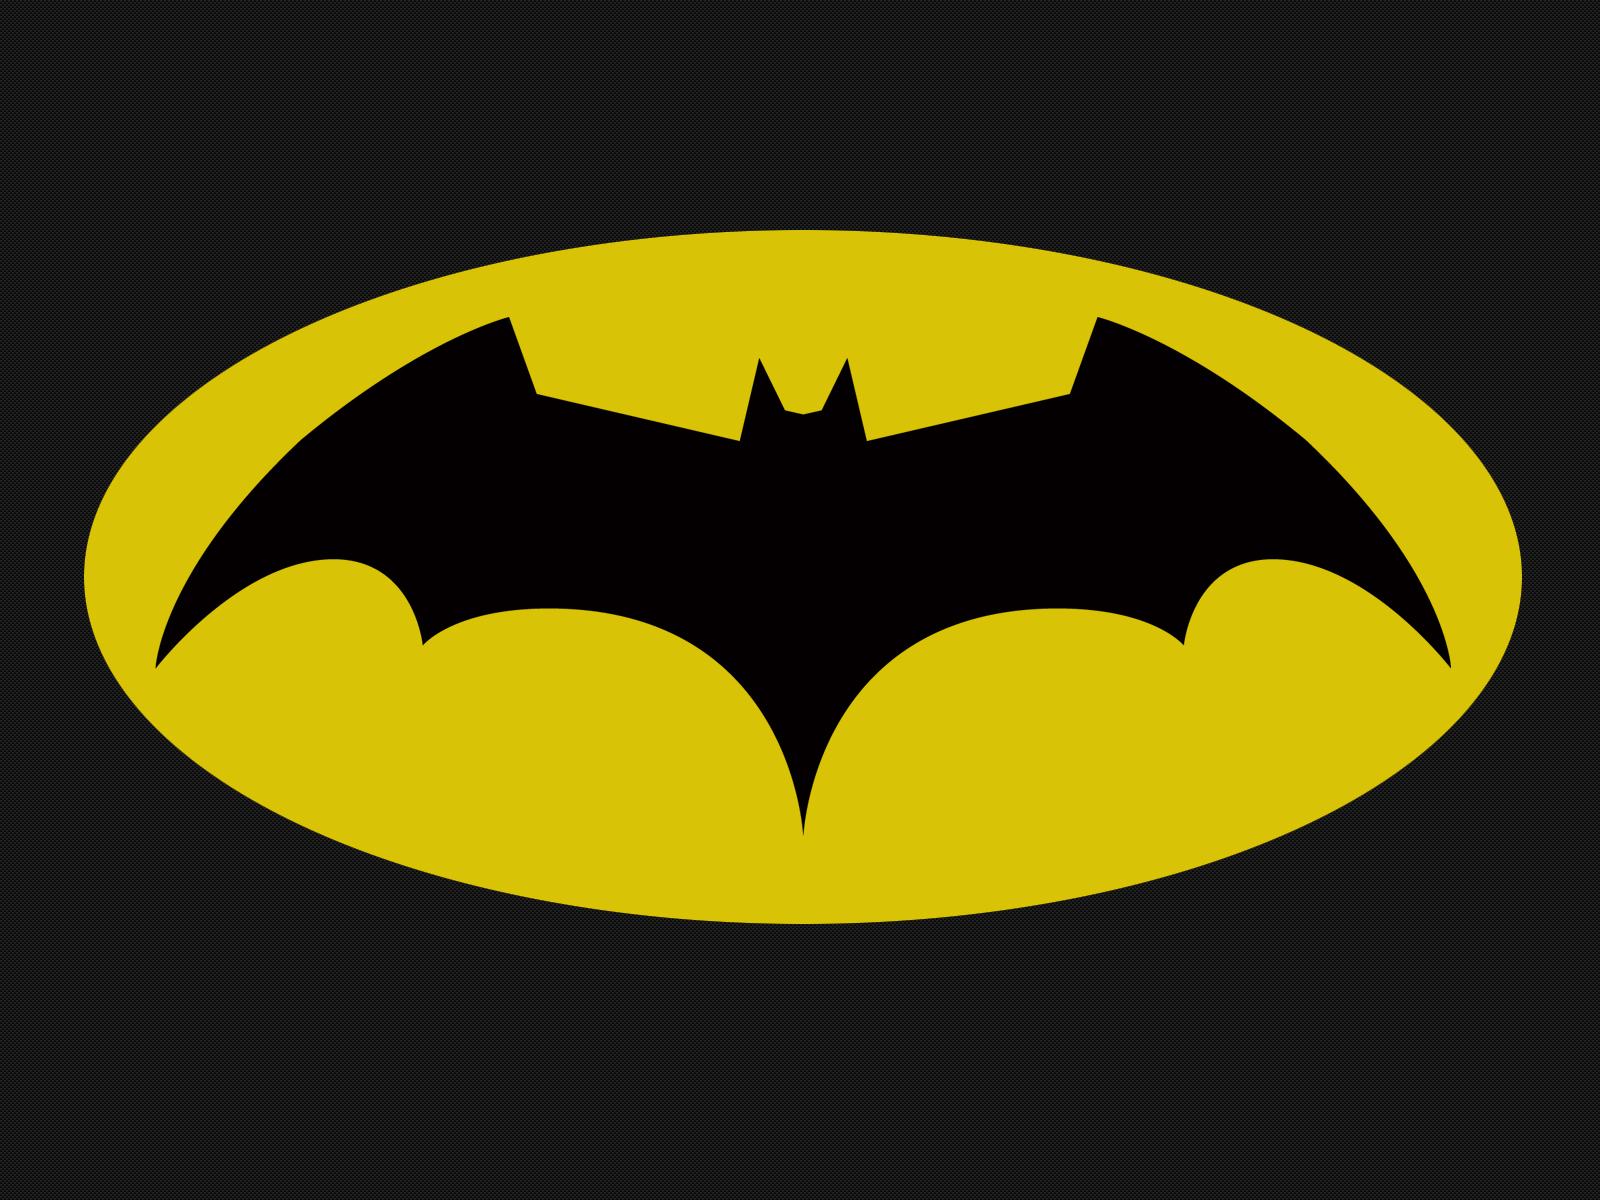 Batman Logo Wallpapers (40 Wallpapers) - Adorable Wallpapers